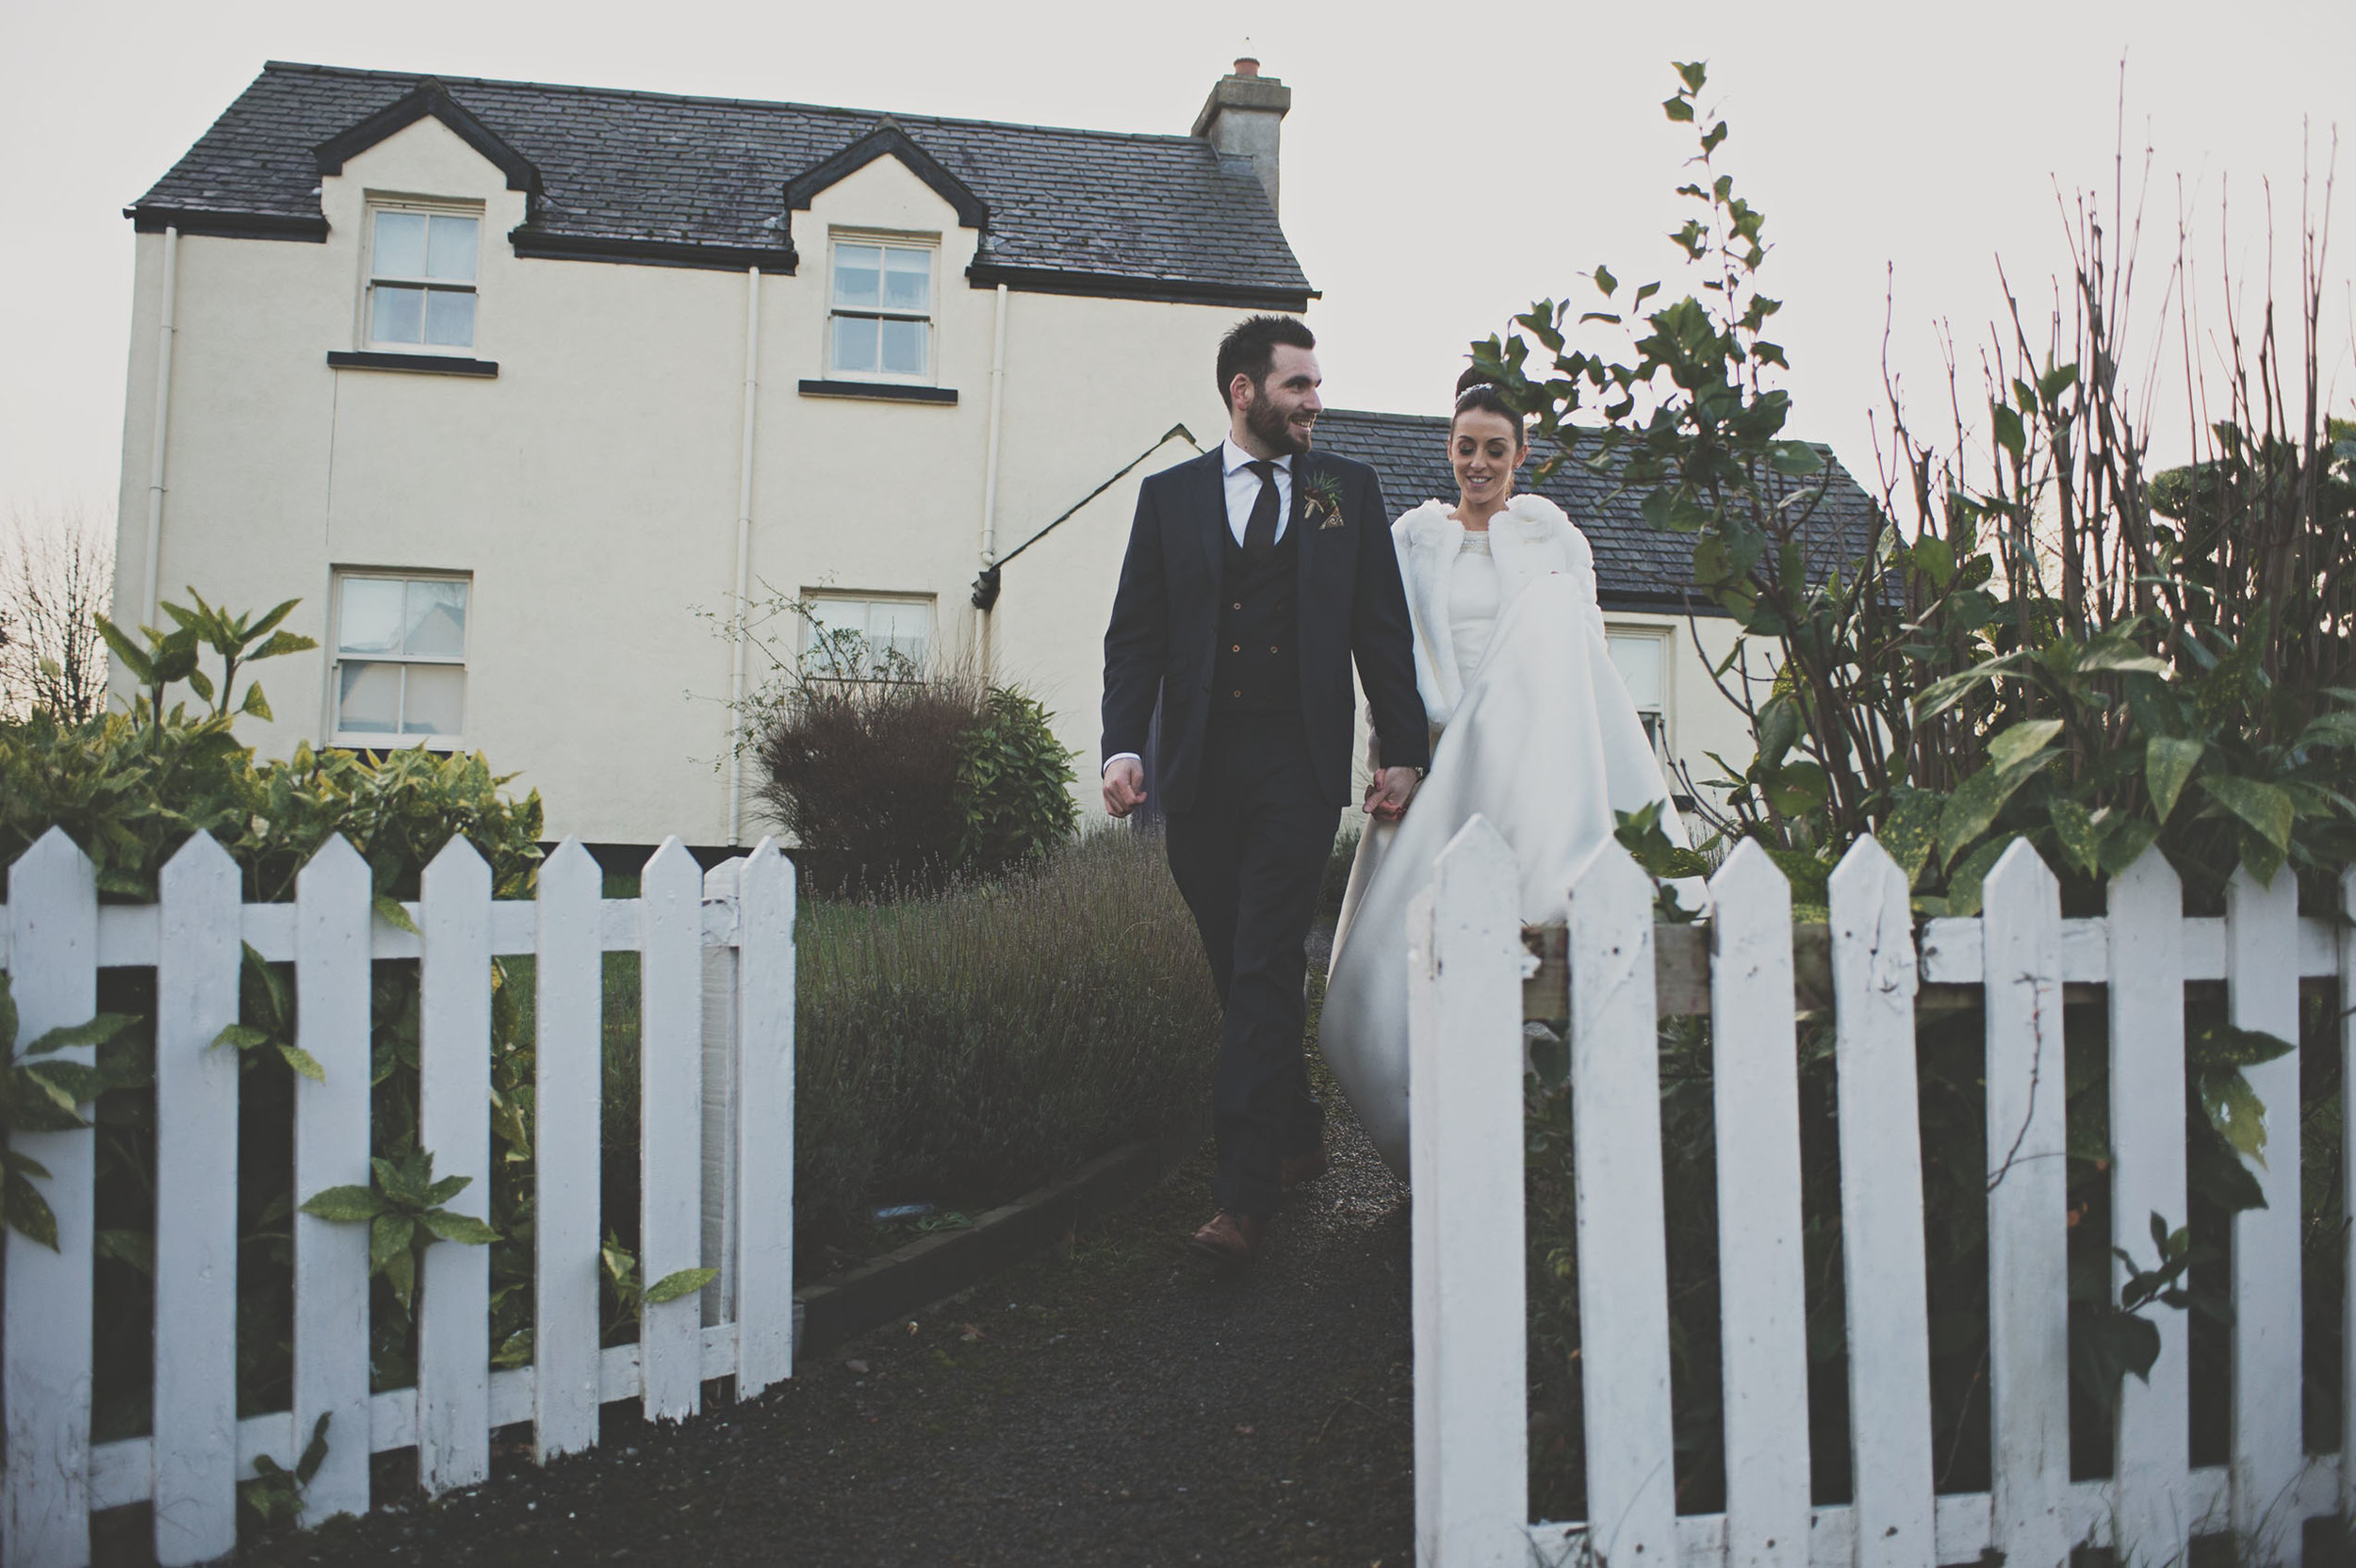 Tricia & Maurice's Coolbawn Quay Wedding 087.jpg